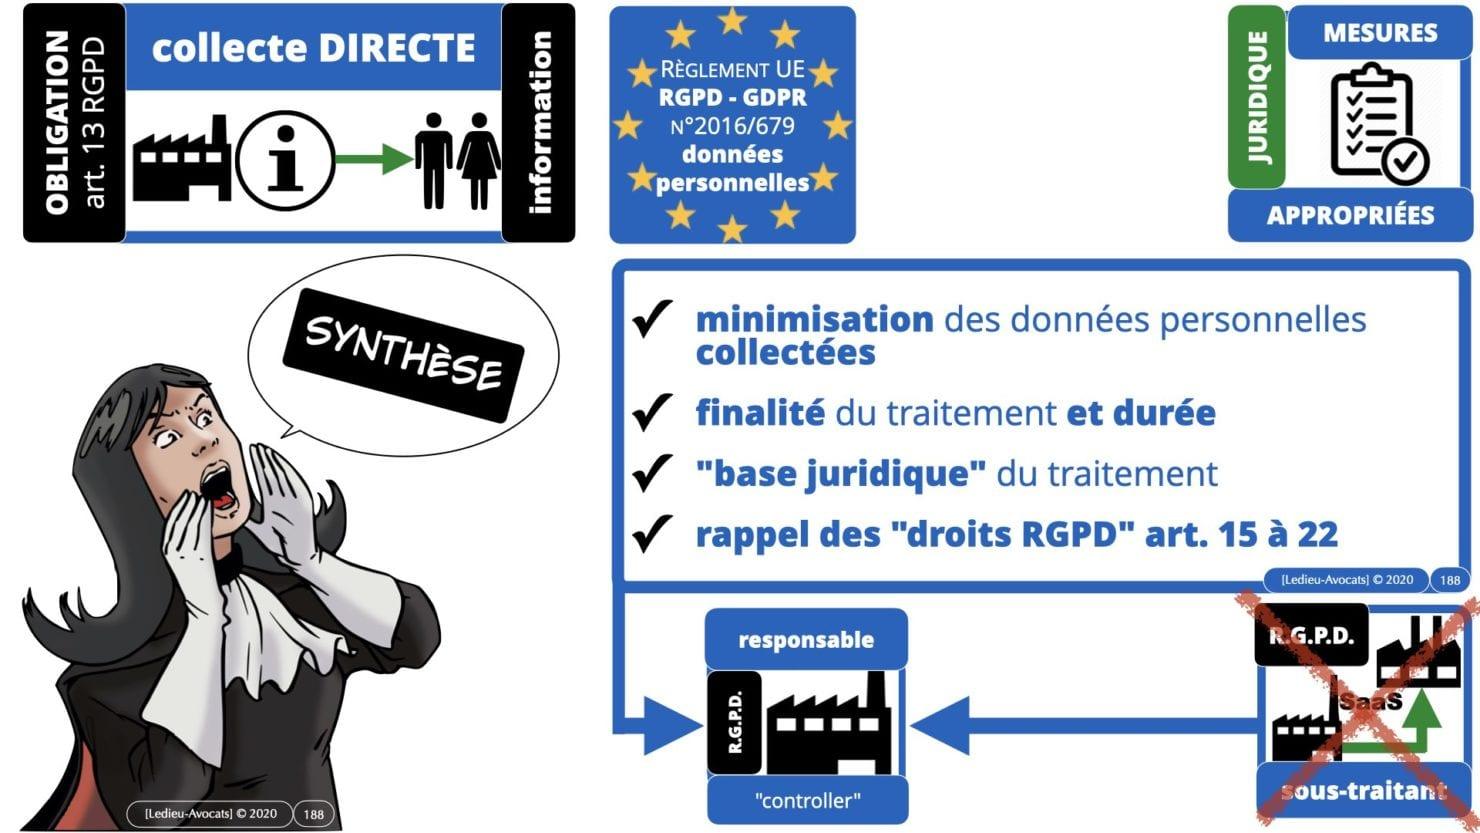 RGPD e-Privacy principes actualité jurisprudence ©Ledieu-Avocats 25-06-2021.188